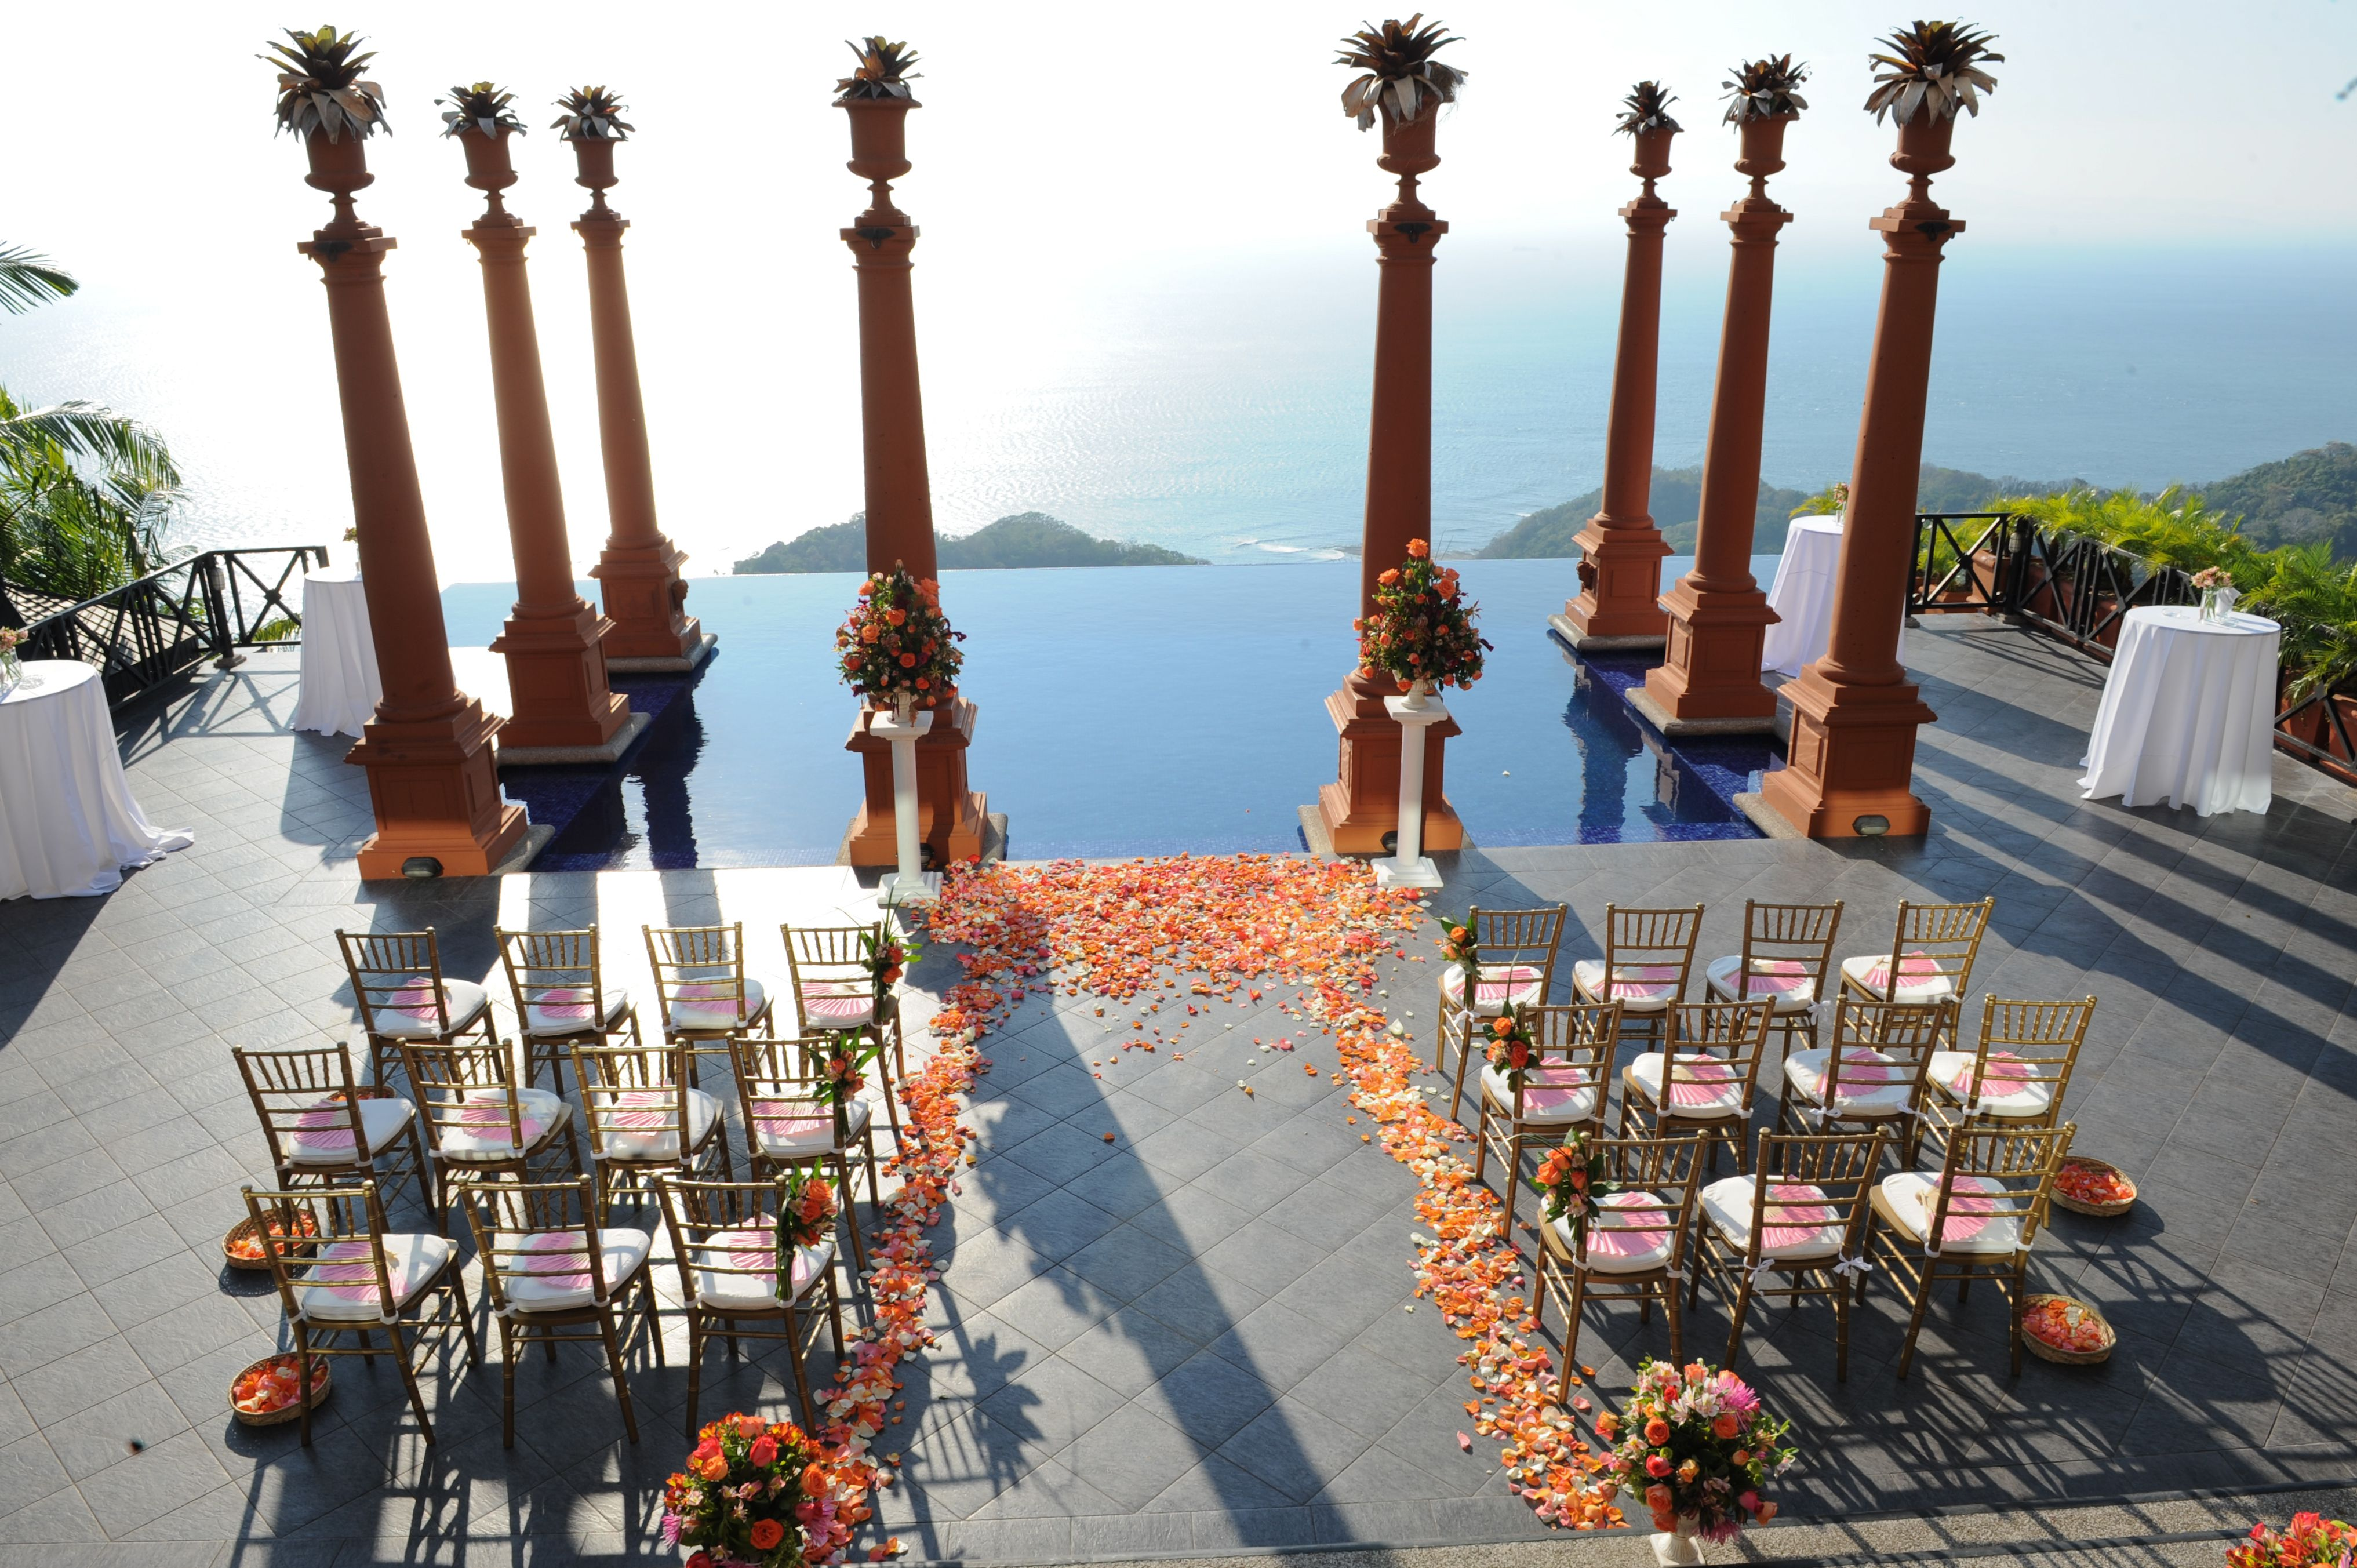 Fucshia And Orange Ceremony At Zephyr Palace Costa Rica Weddings The Bridal Circle